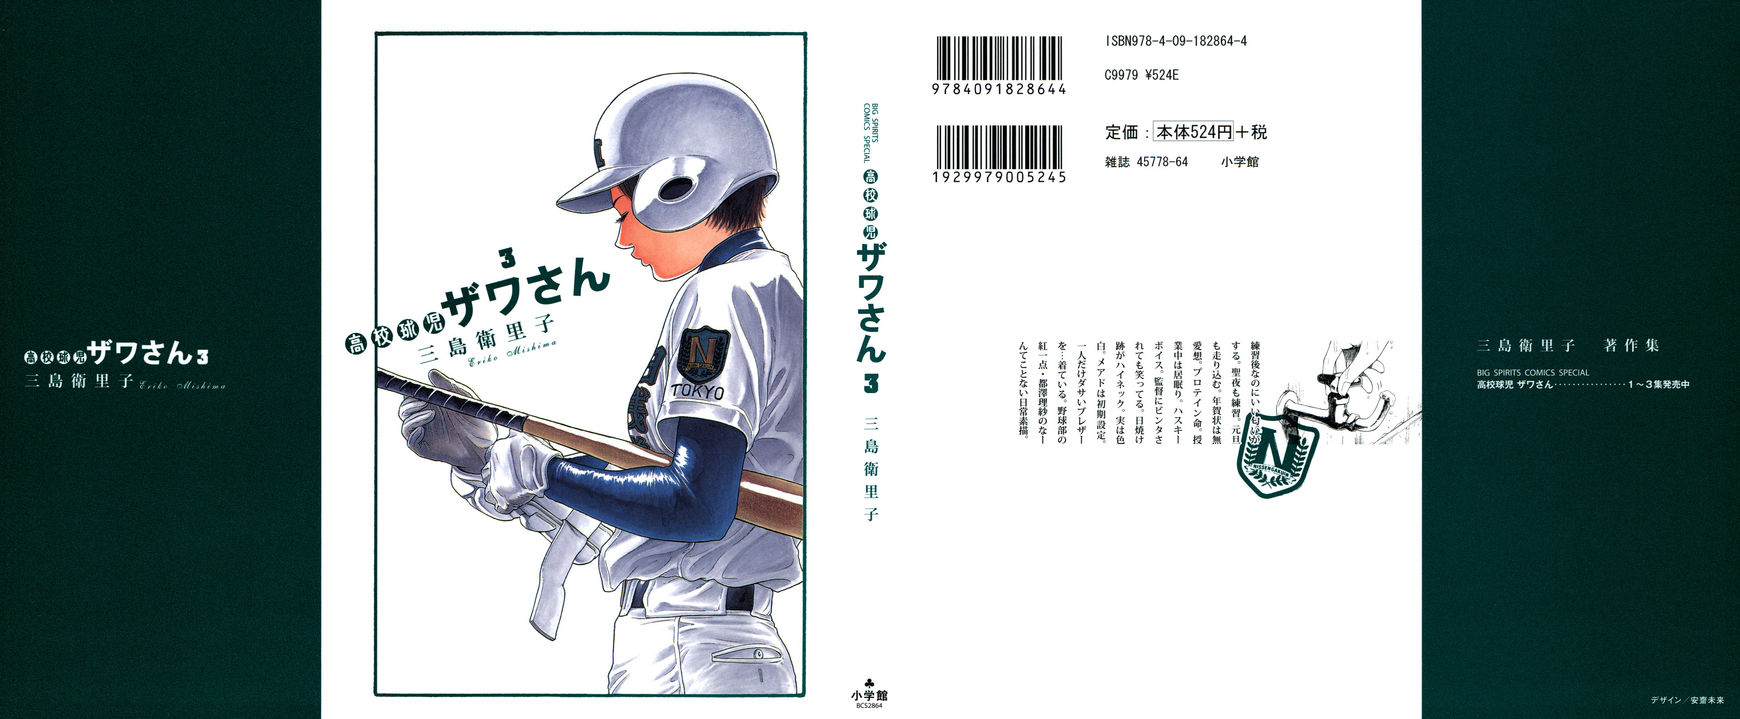 Koukou Kyuuji Zawa-san 33 Page 1